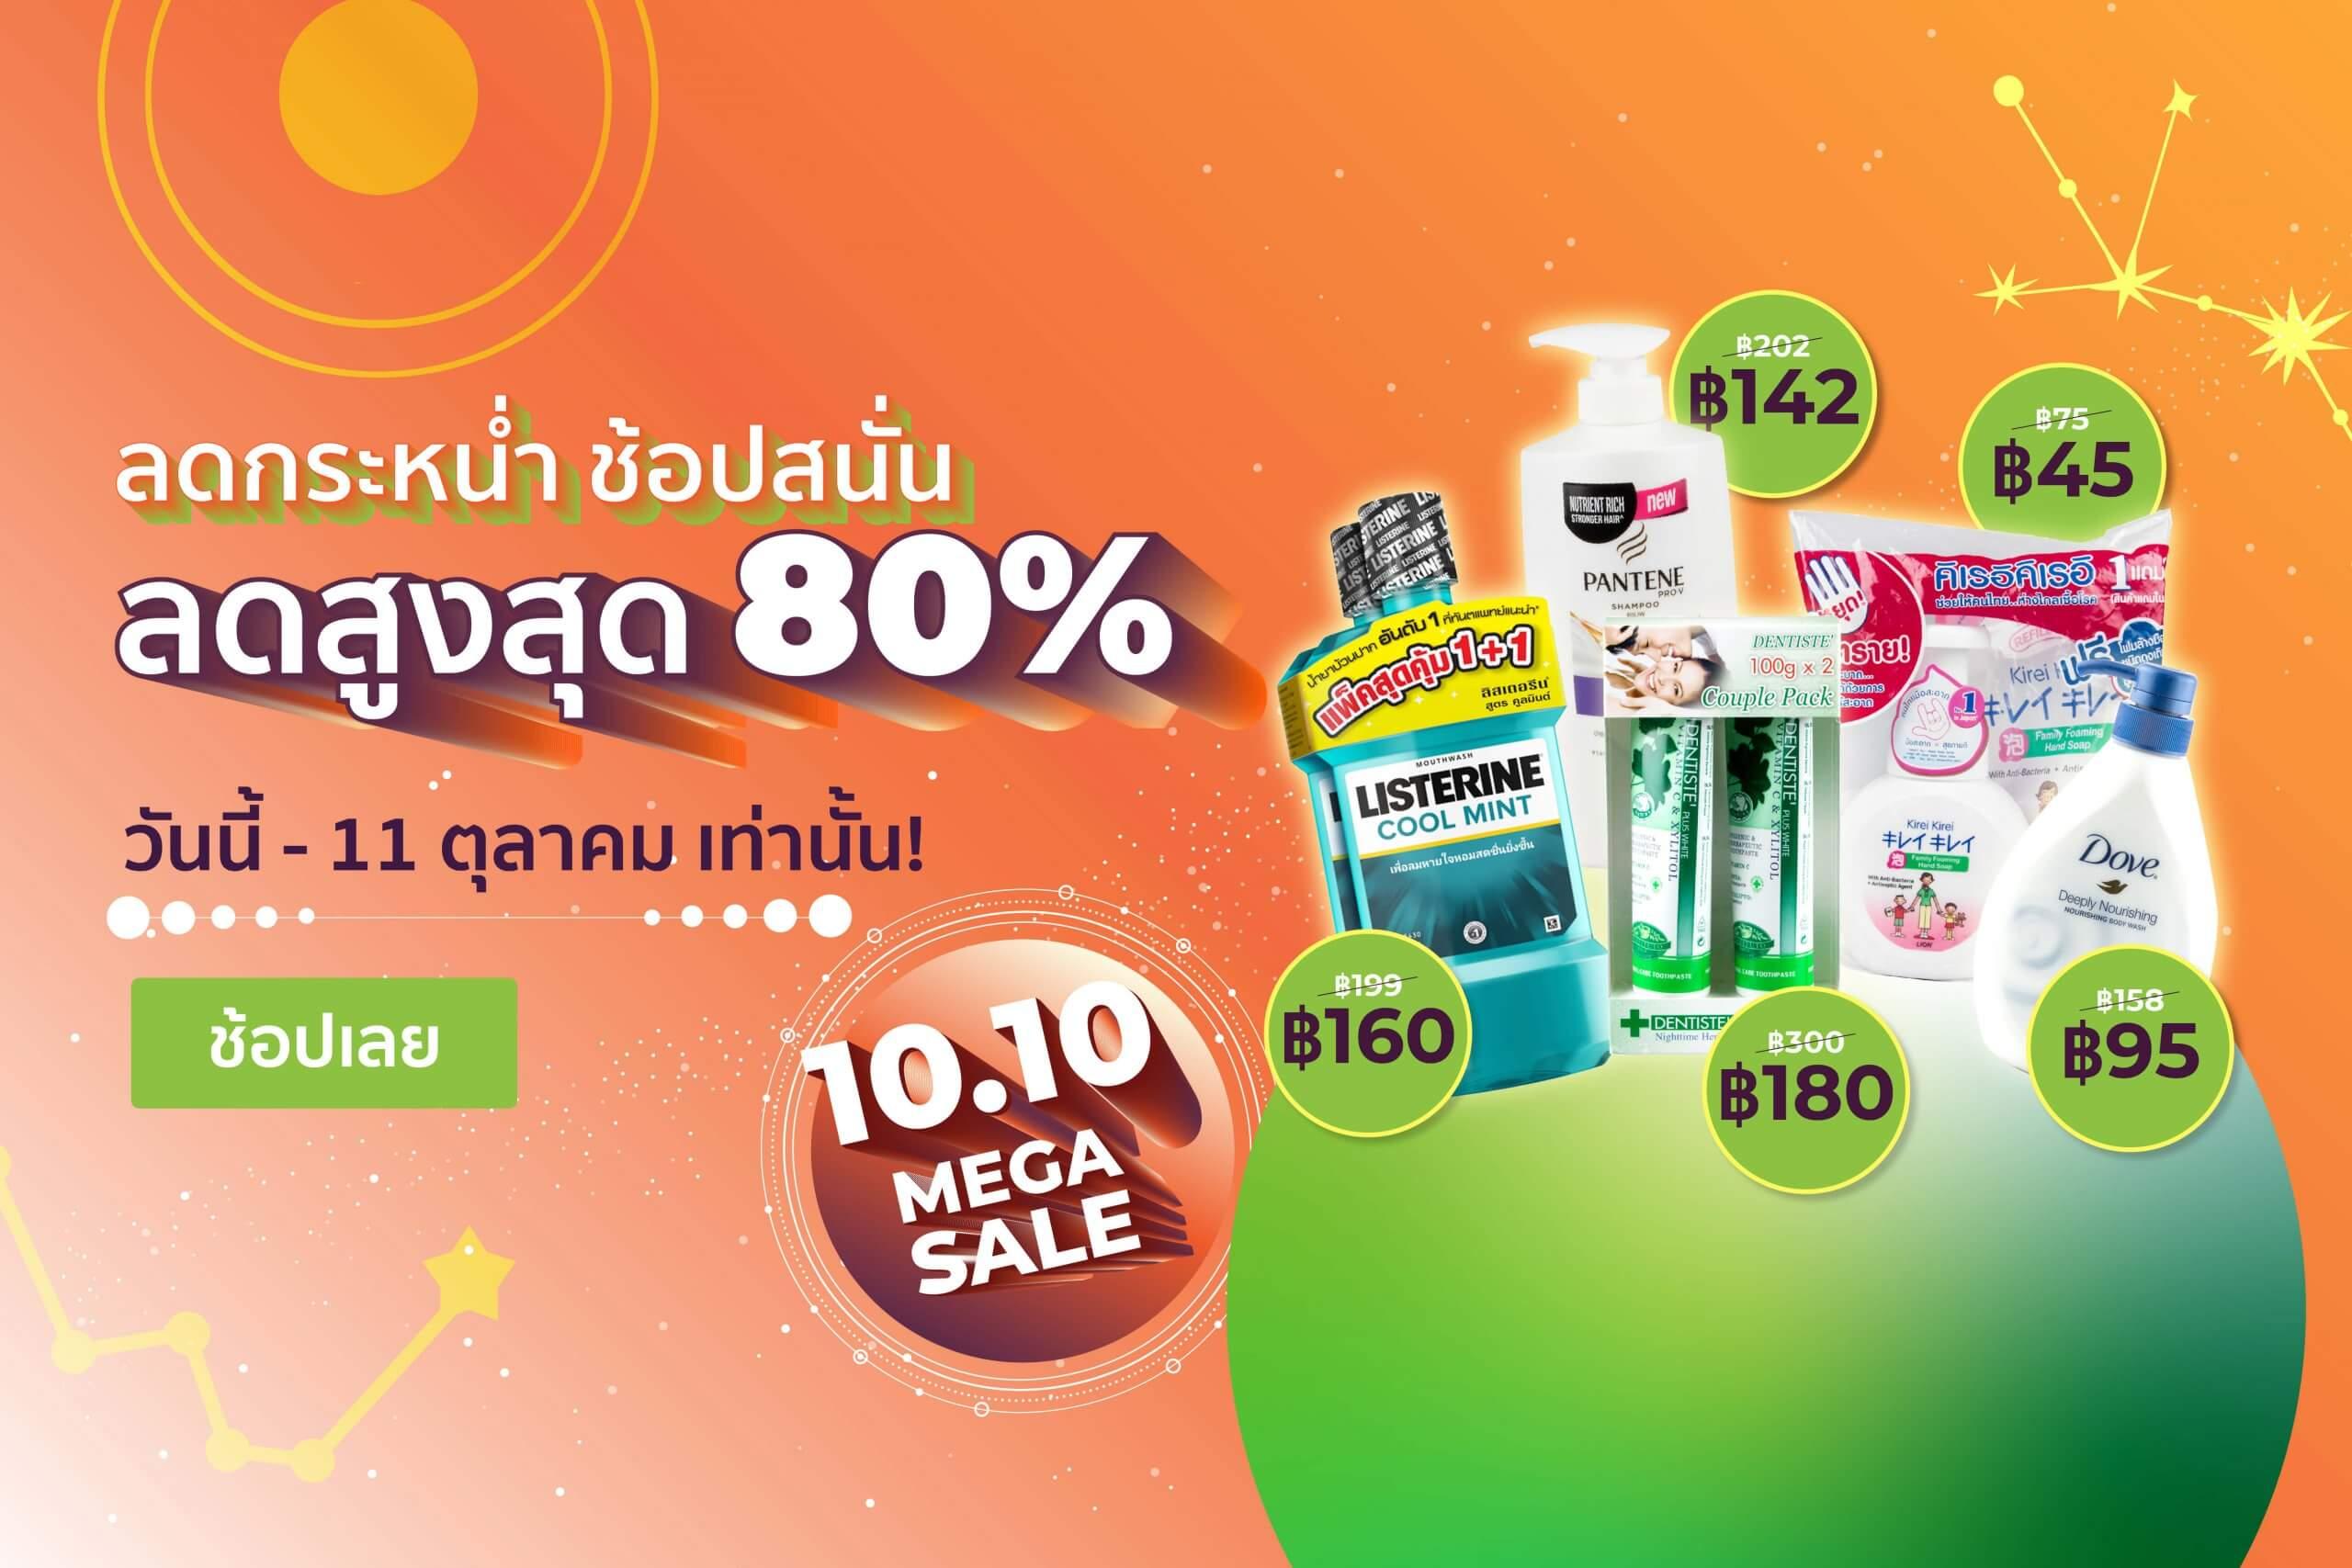 HappyFresh_Homepage_Banner_10_10_Mega_Sale_Lotus_Big_C